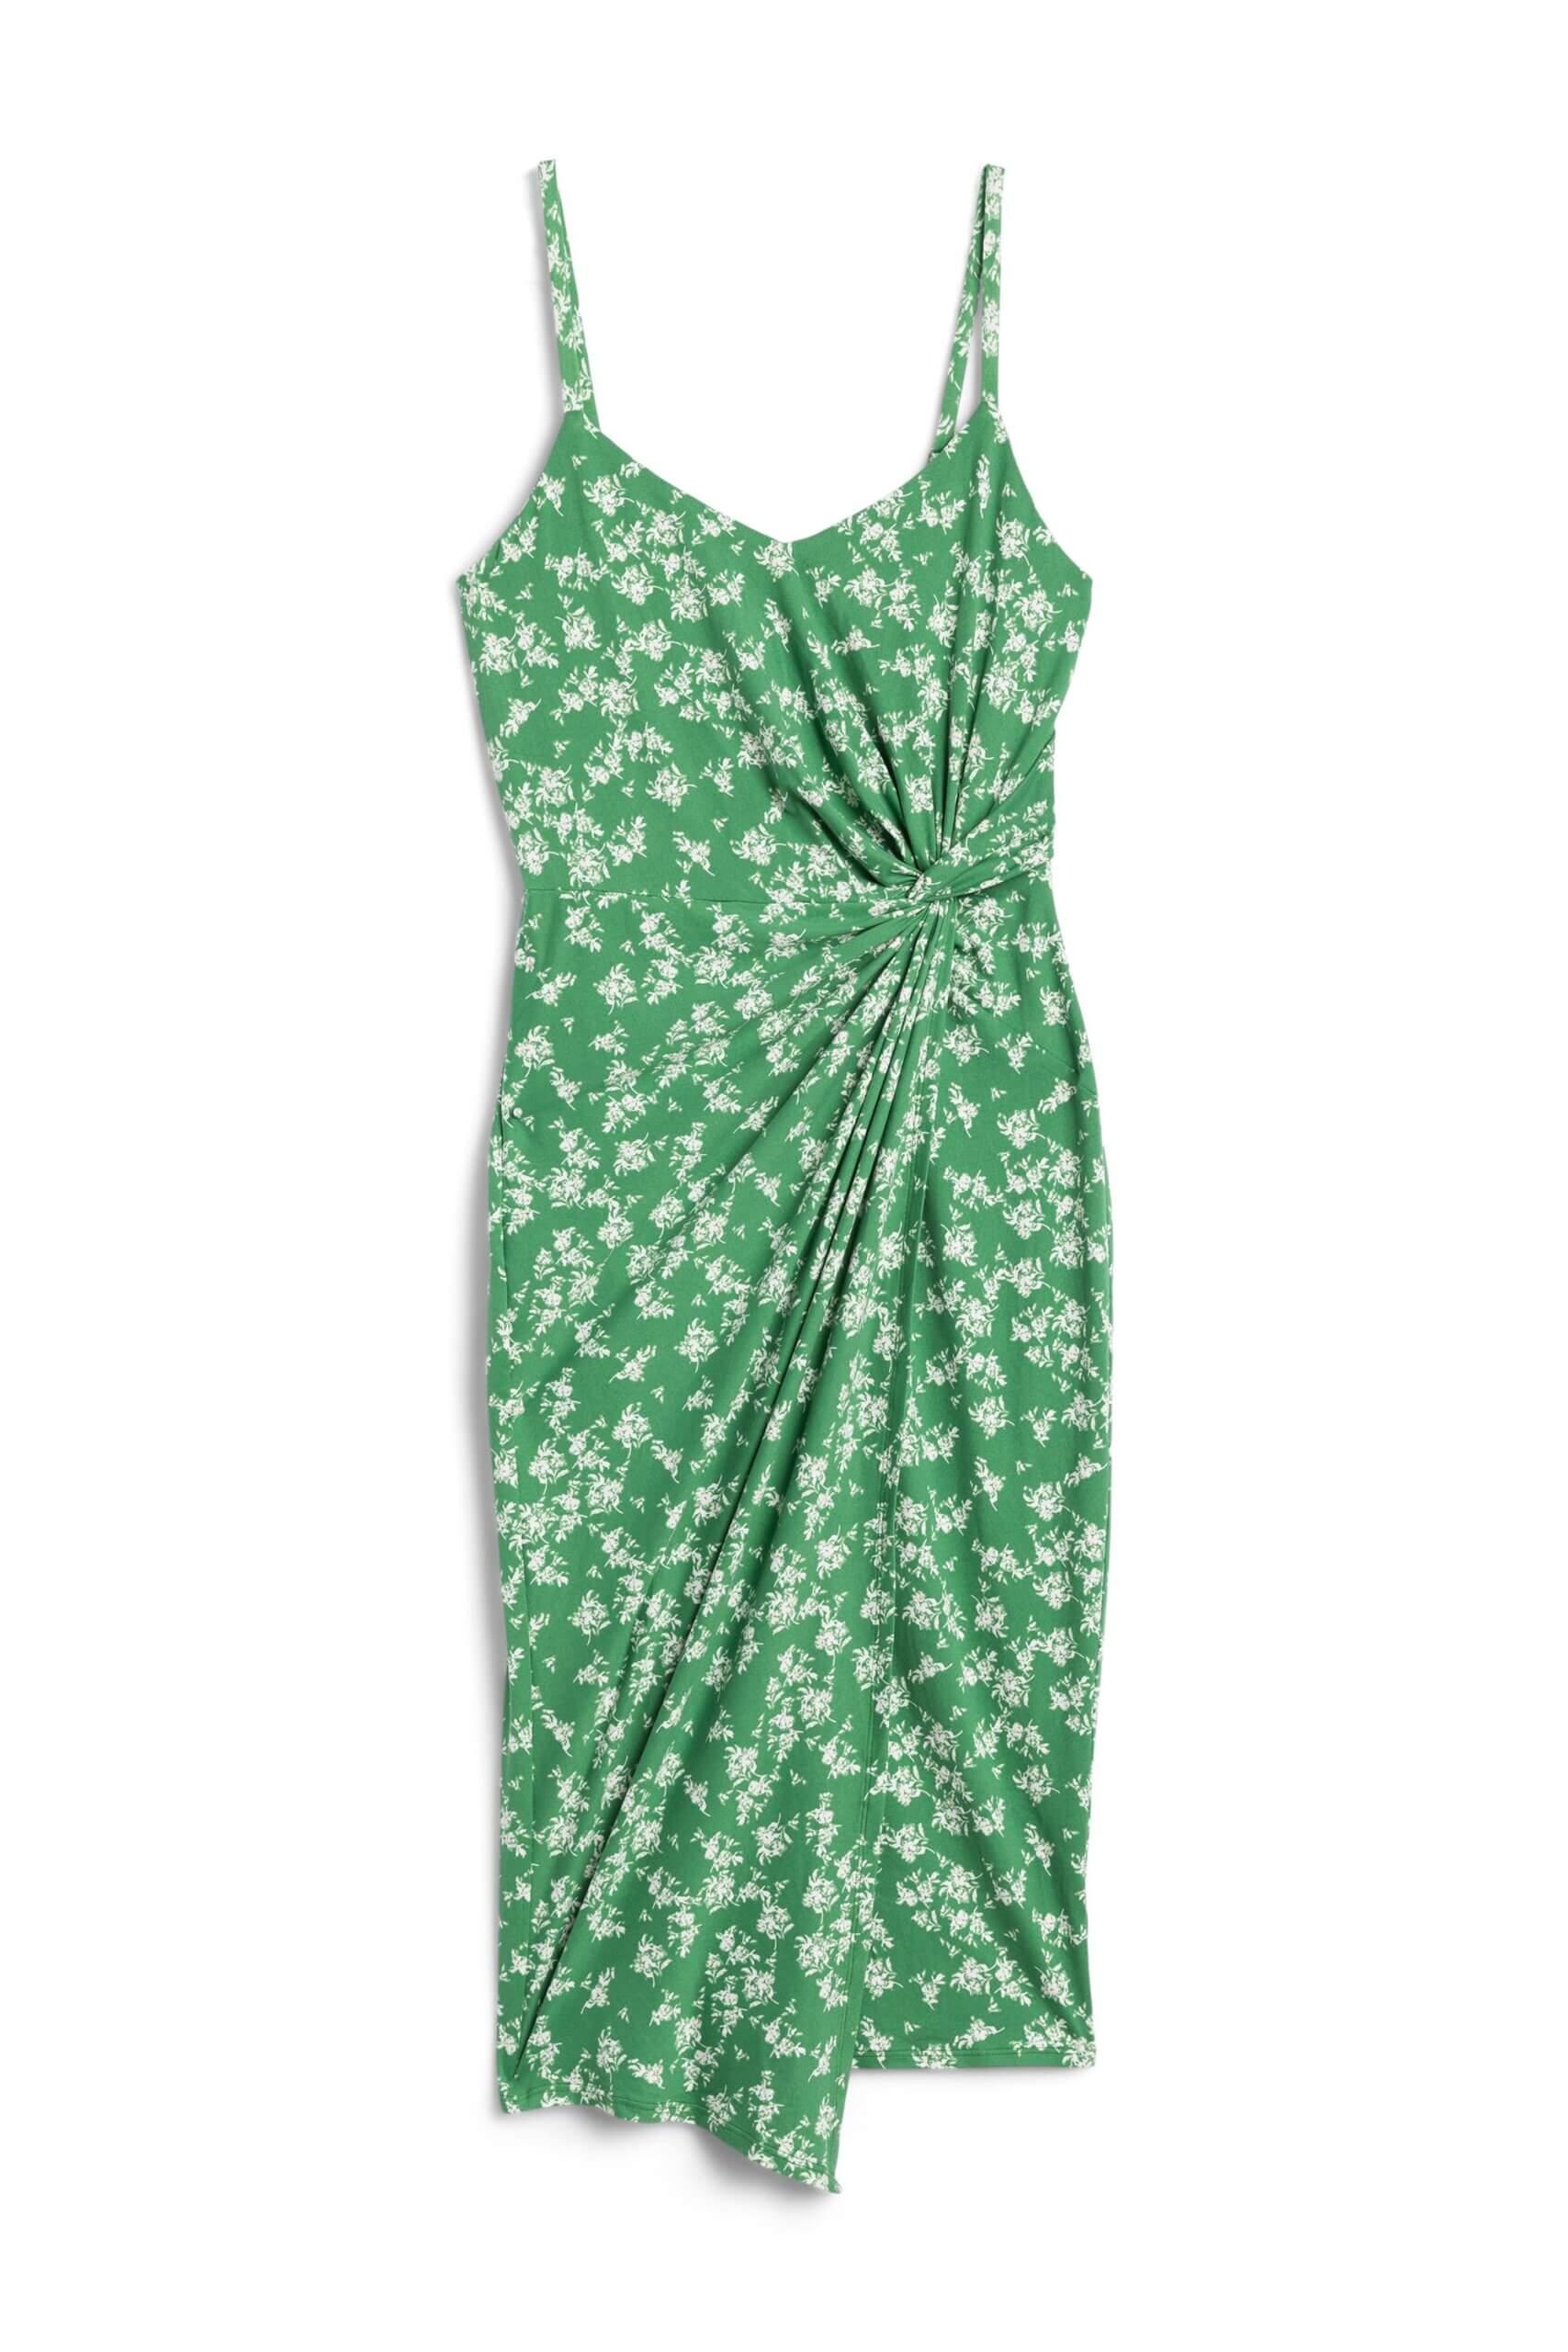 Stitch Fix women's green midi dress with dainty white floral pattern.